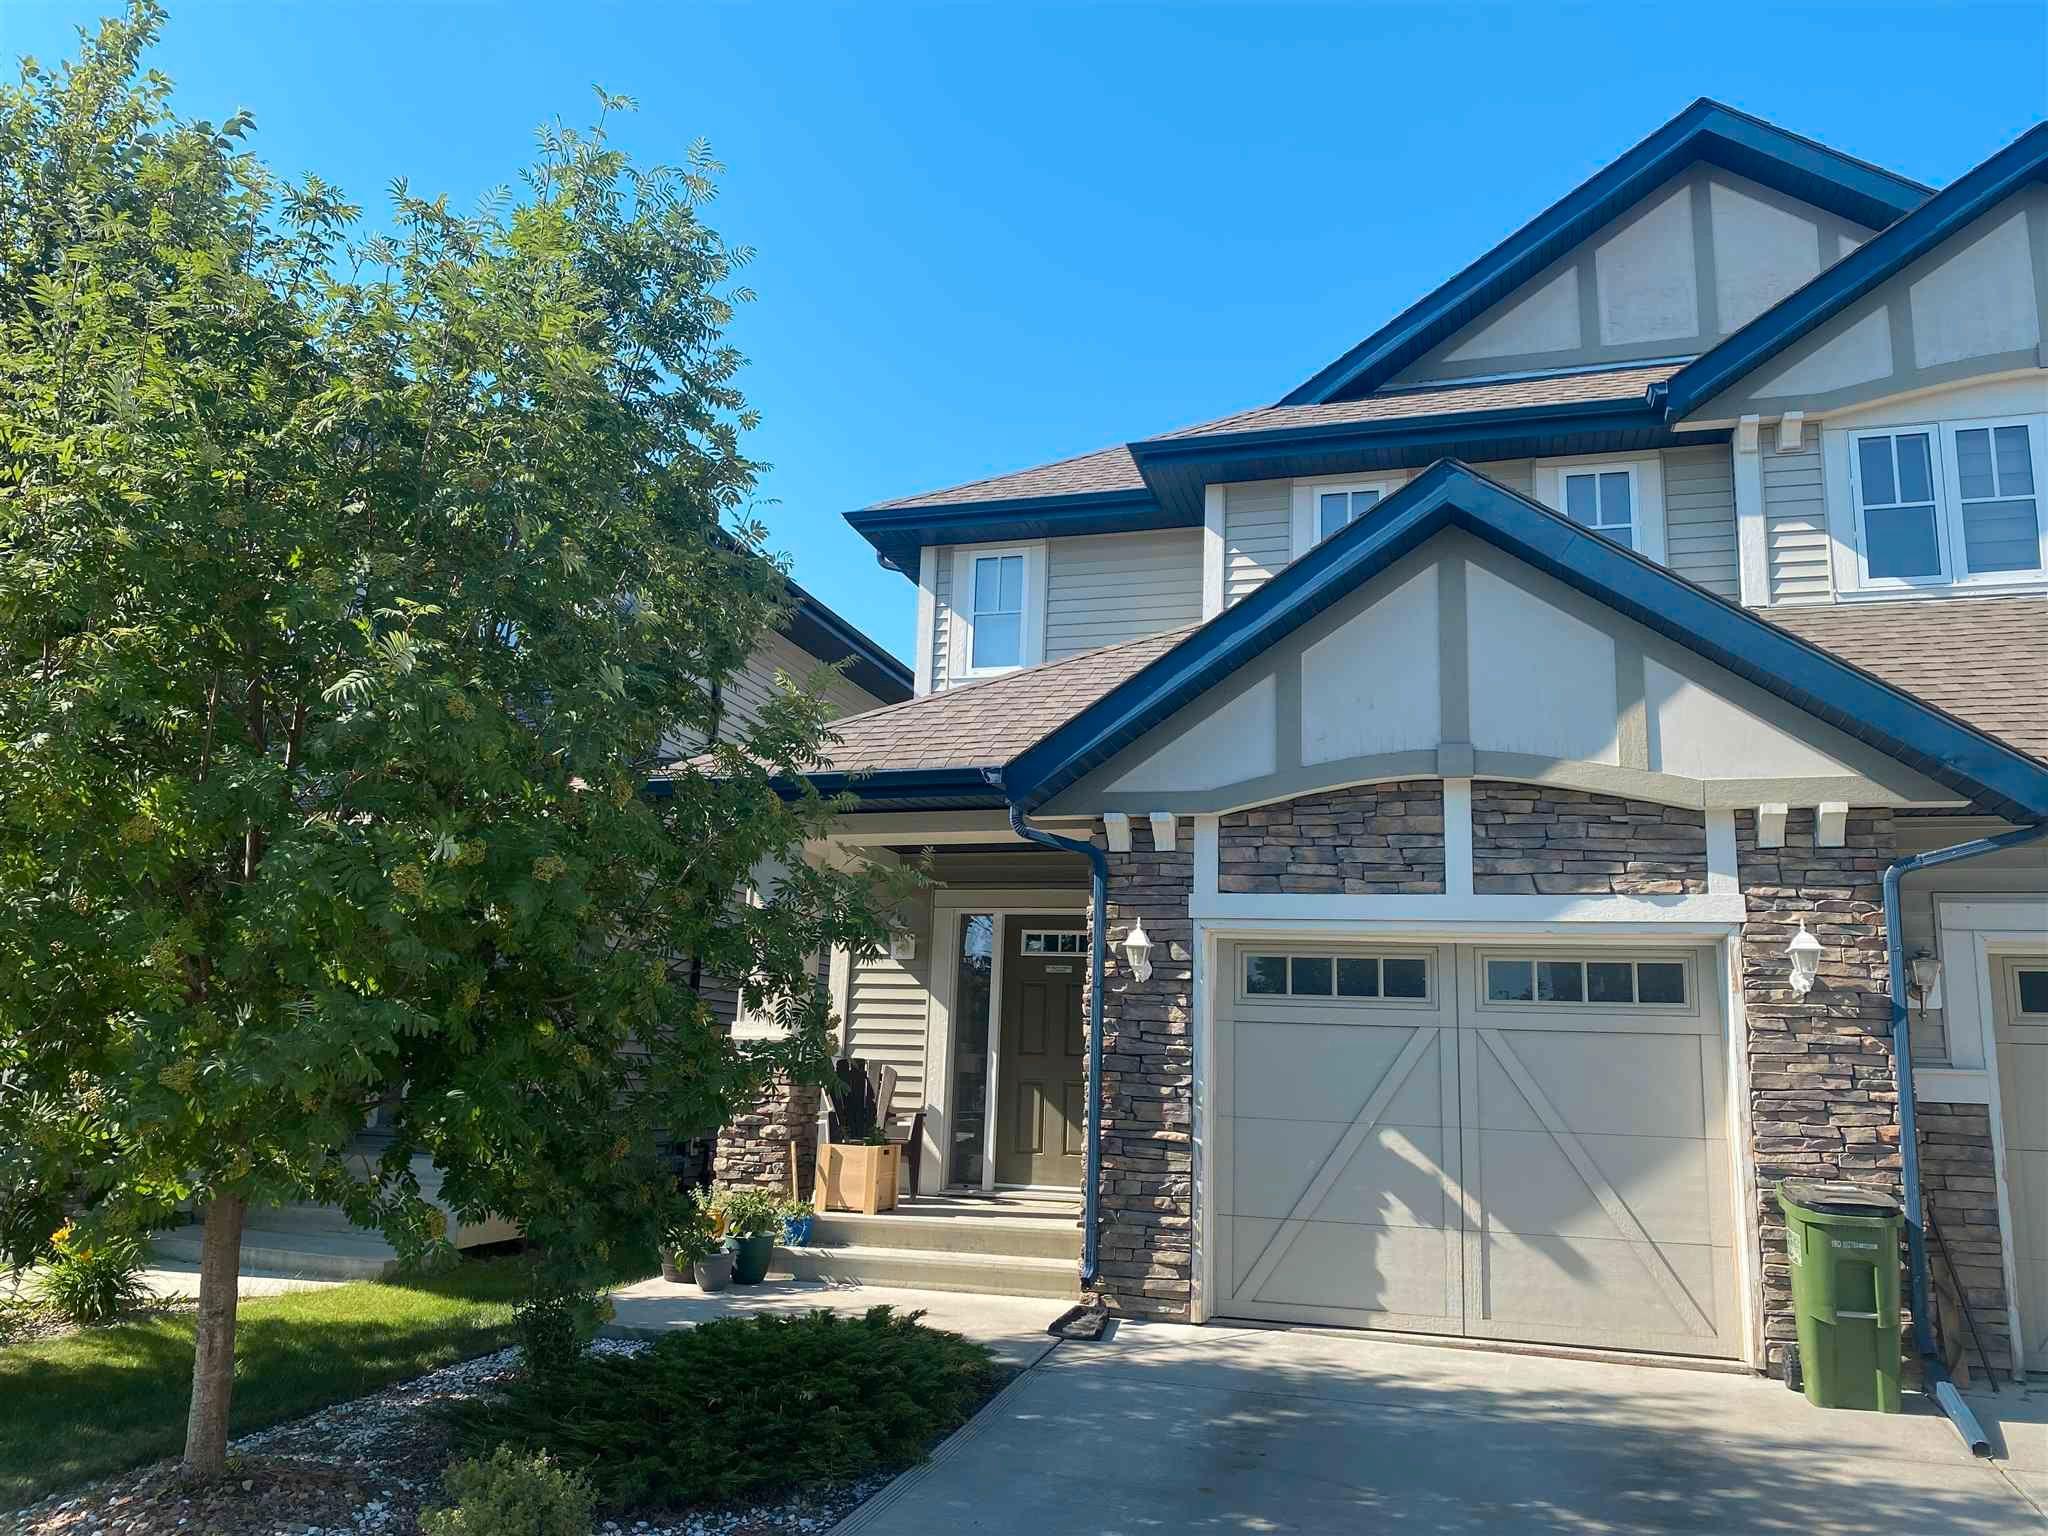 Main Photo: 2263 AUSTIN Way in Edmonton: Zone 56 House Half Duplex for sale : MLS®# E4261930